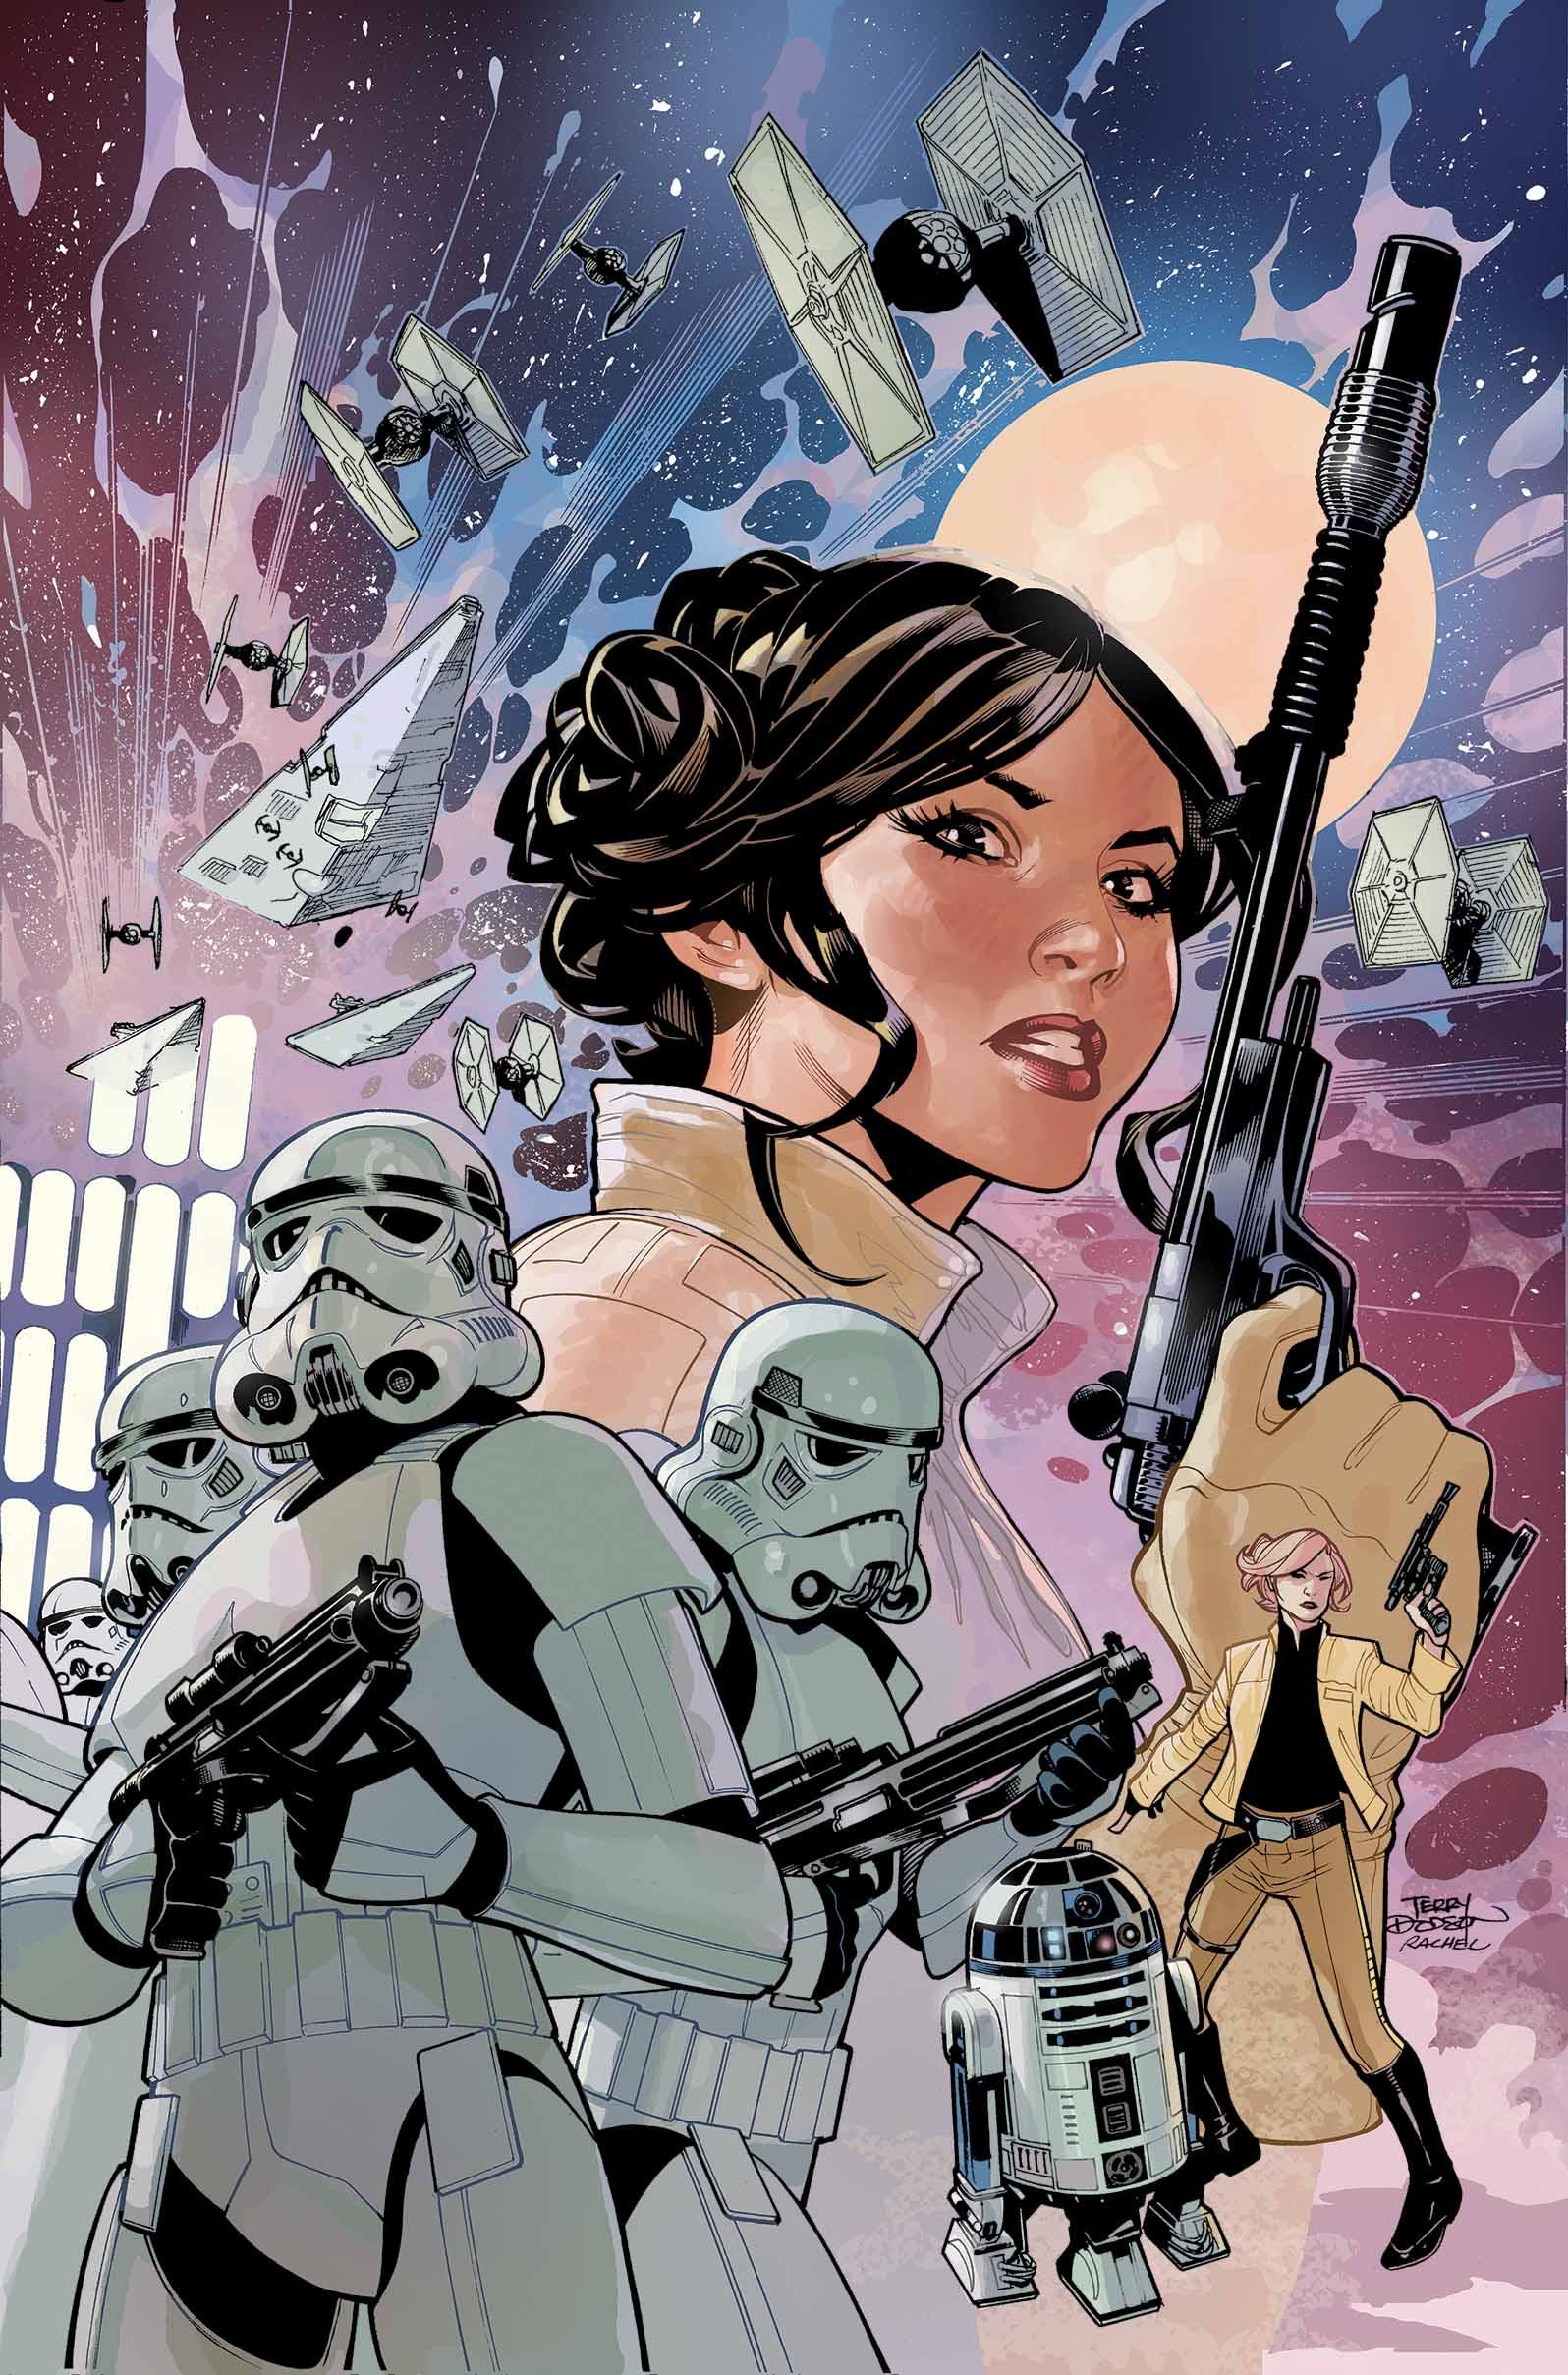 Star Wars: Princess Leia 4 - Wookieepedia, the Star Wars Wiki How Old Is Princess Leia In Star Wars Rebels